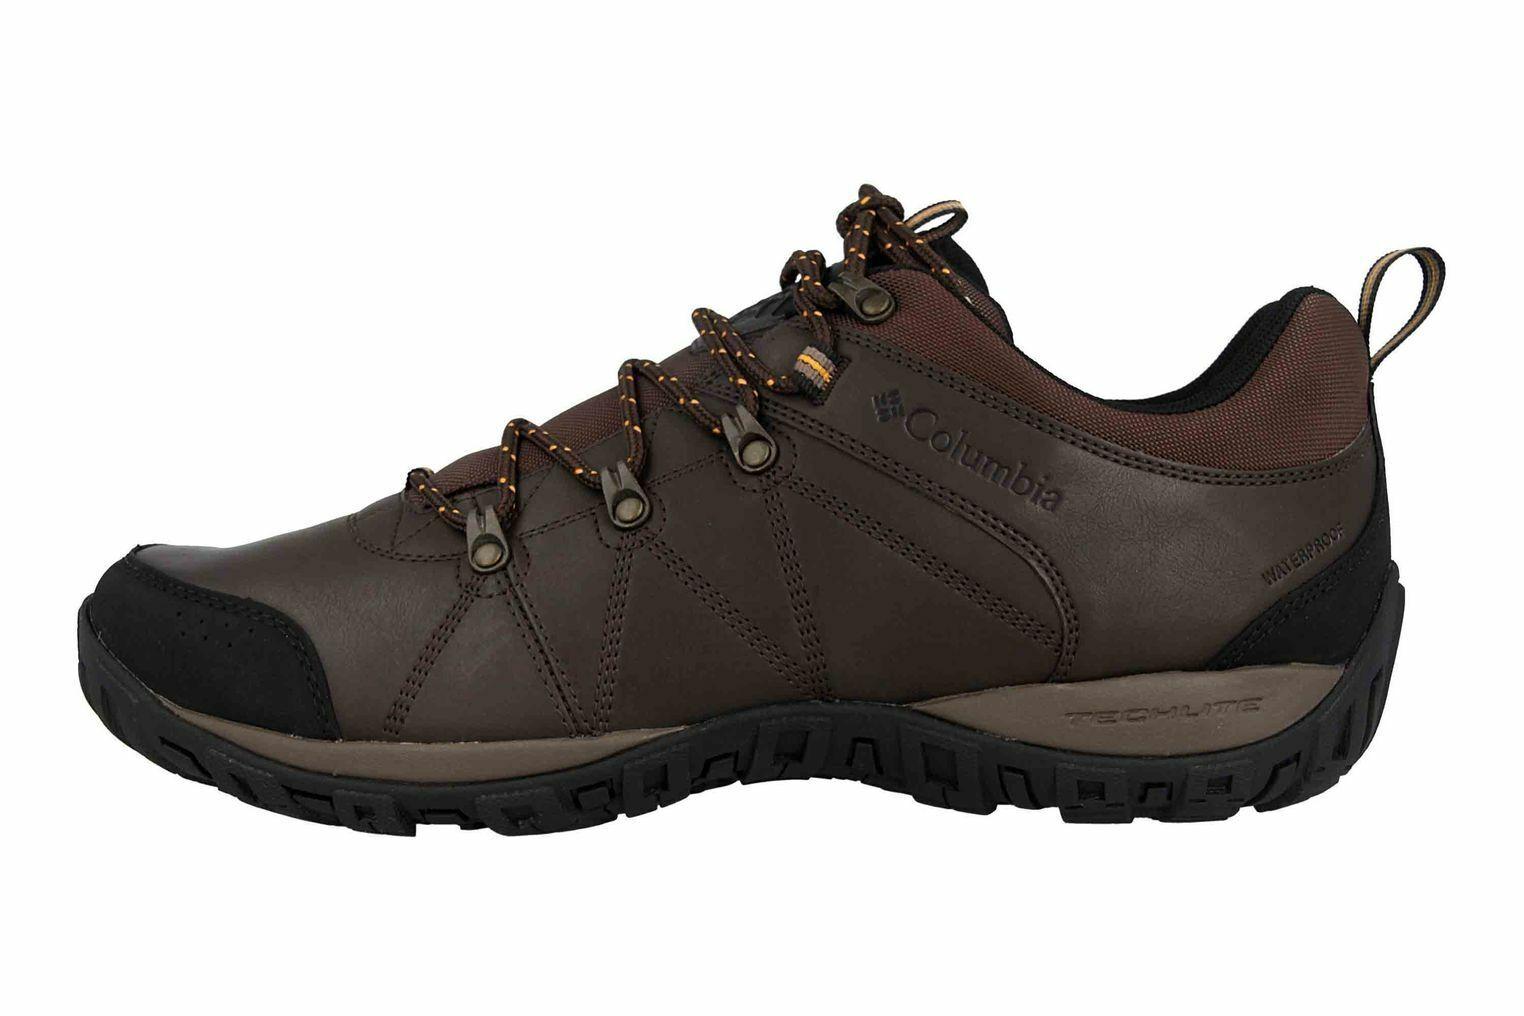 Columbia Peakfreak Hiking shoes Sizes Extra Large Brown BM 3992-231